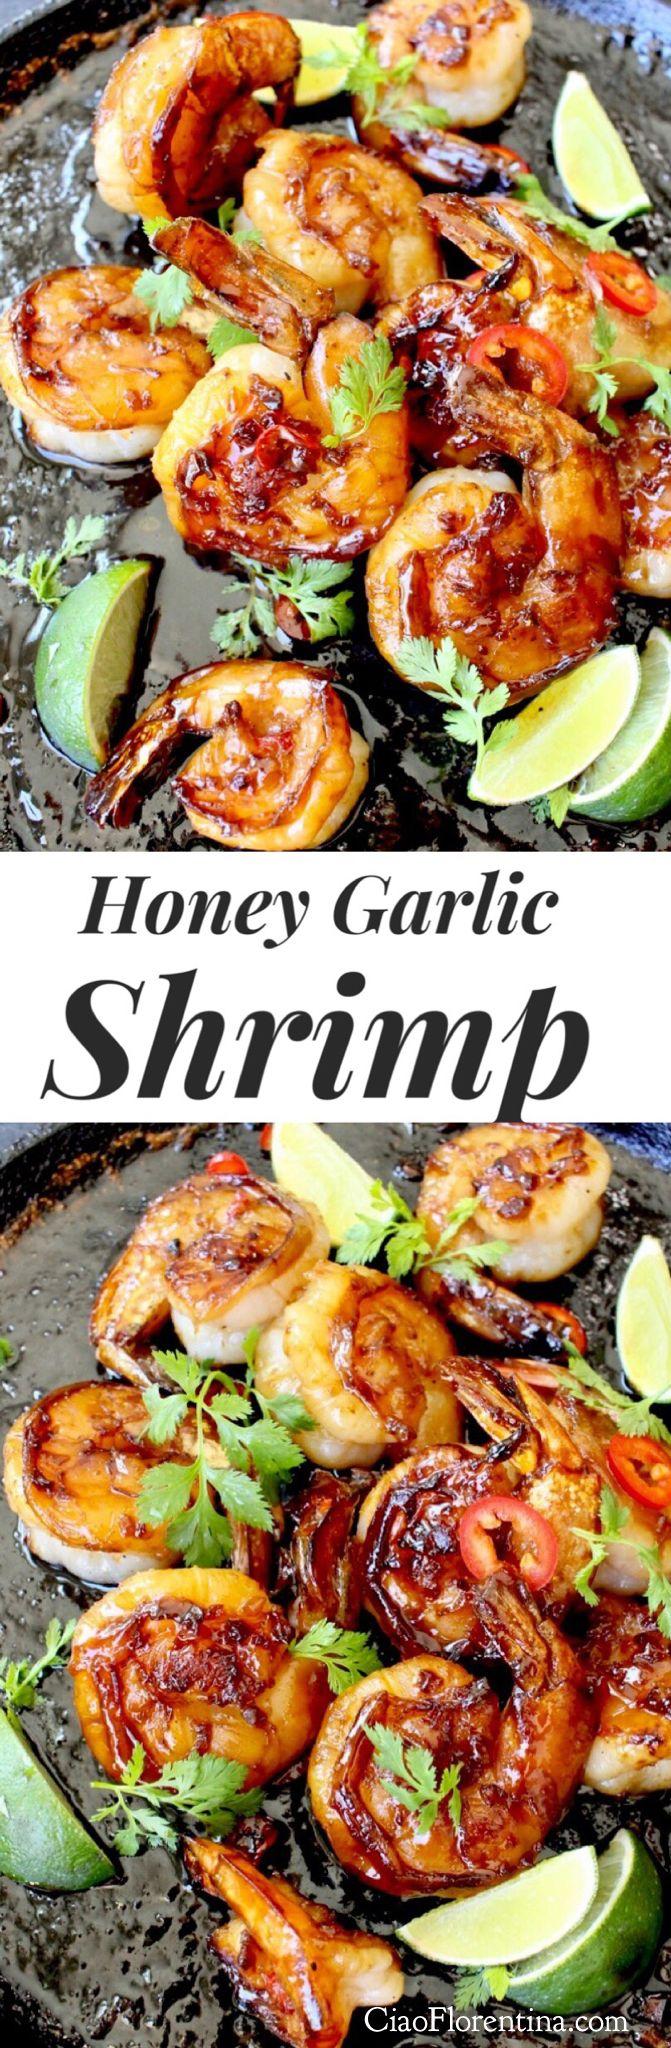 Honey Garlic Shrimp, Easy and Quick ready in just 10 minutes | CiaoFlorentina.com @CiaoFlorentina